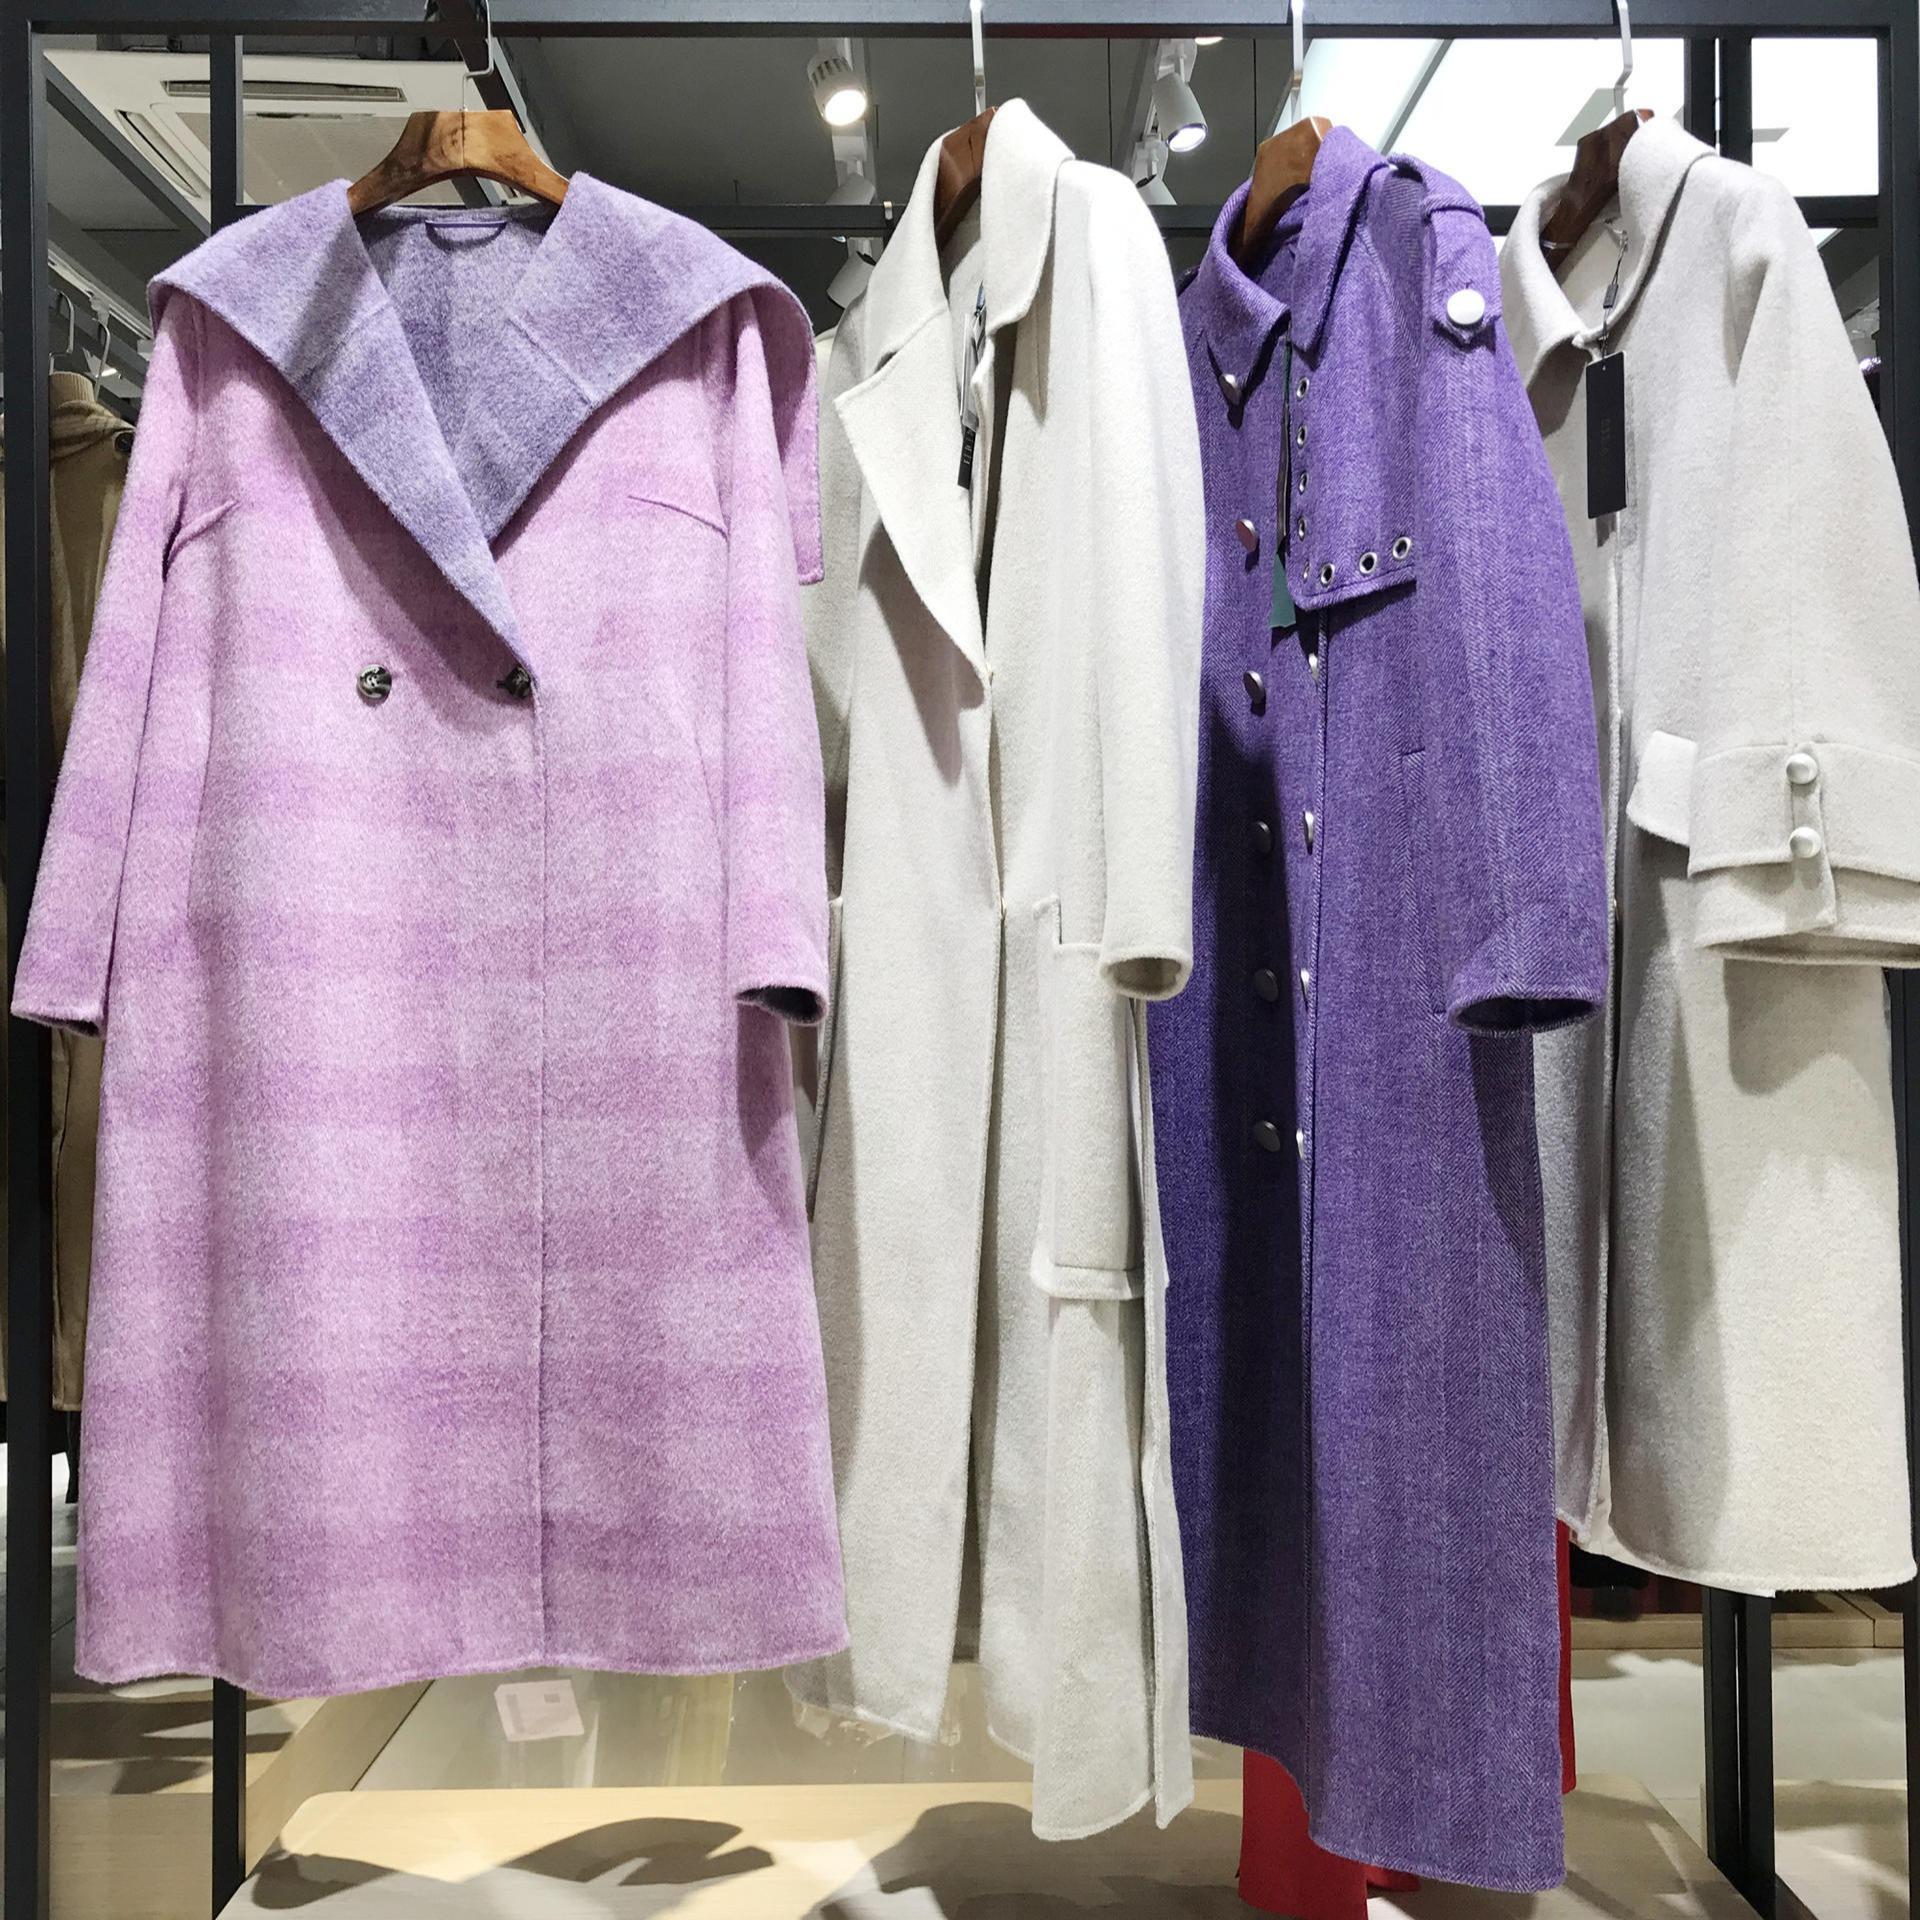 Guizhou zunyi brand discount women's clothing primary source of goods channel counter season women's clothing popular goods guangzhou genfan four seasons women's clothing supply